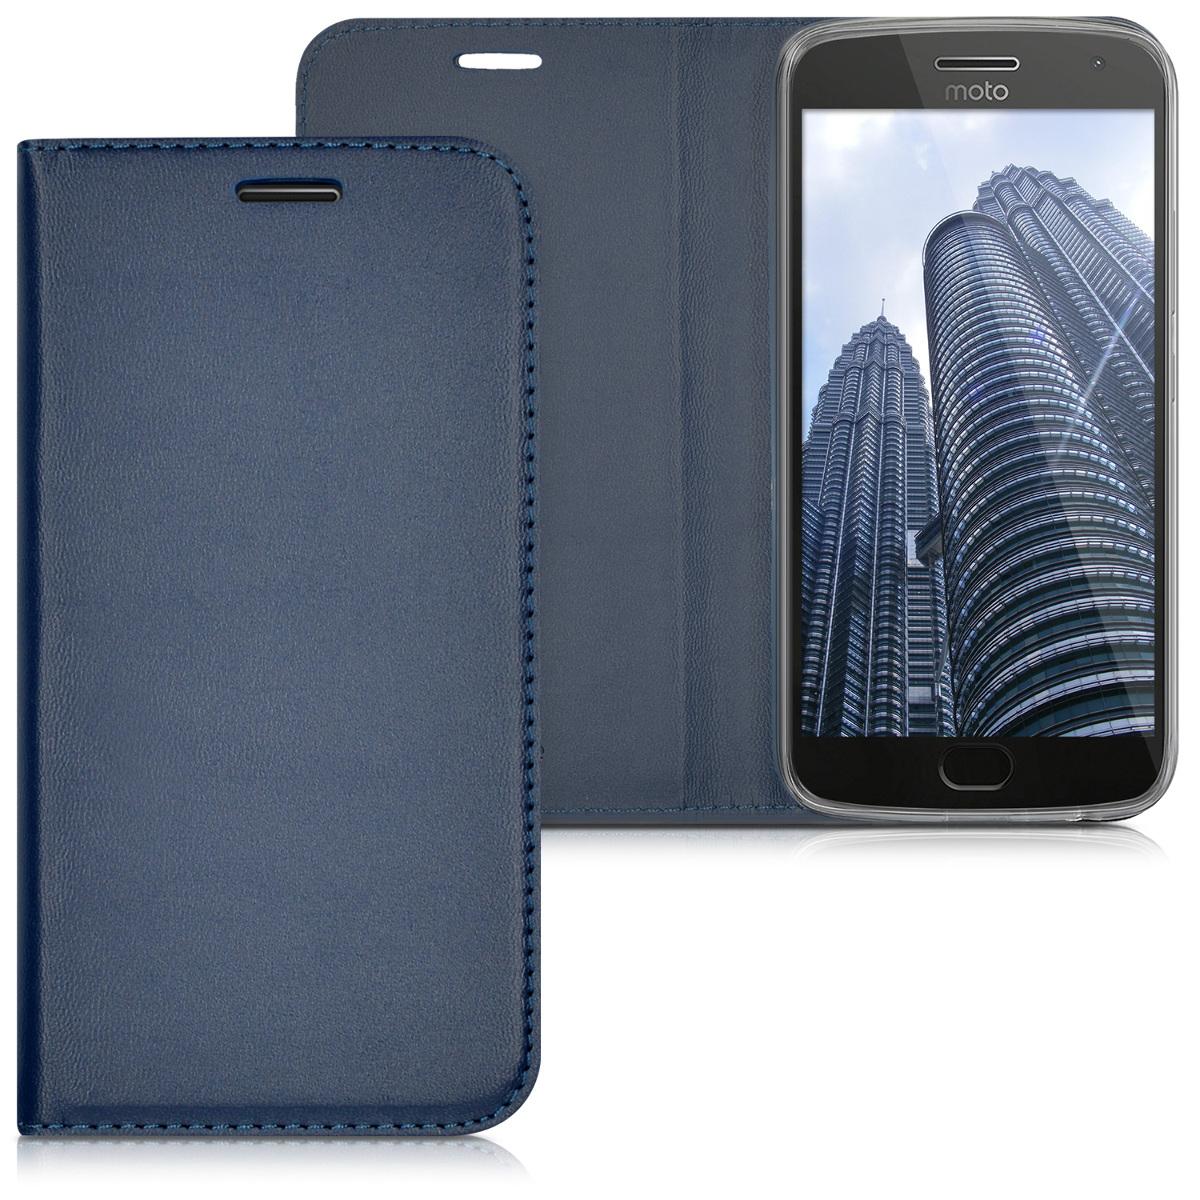 3x folie na display | screenprotector pouzdro | obal pro Motorola Moto G5 Plus - Tmavě modrá